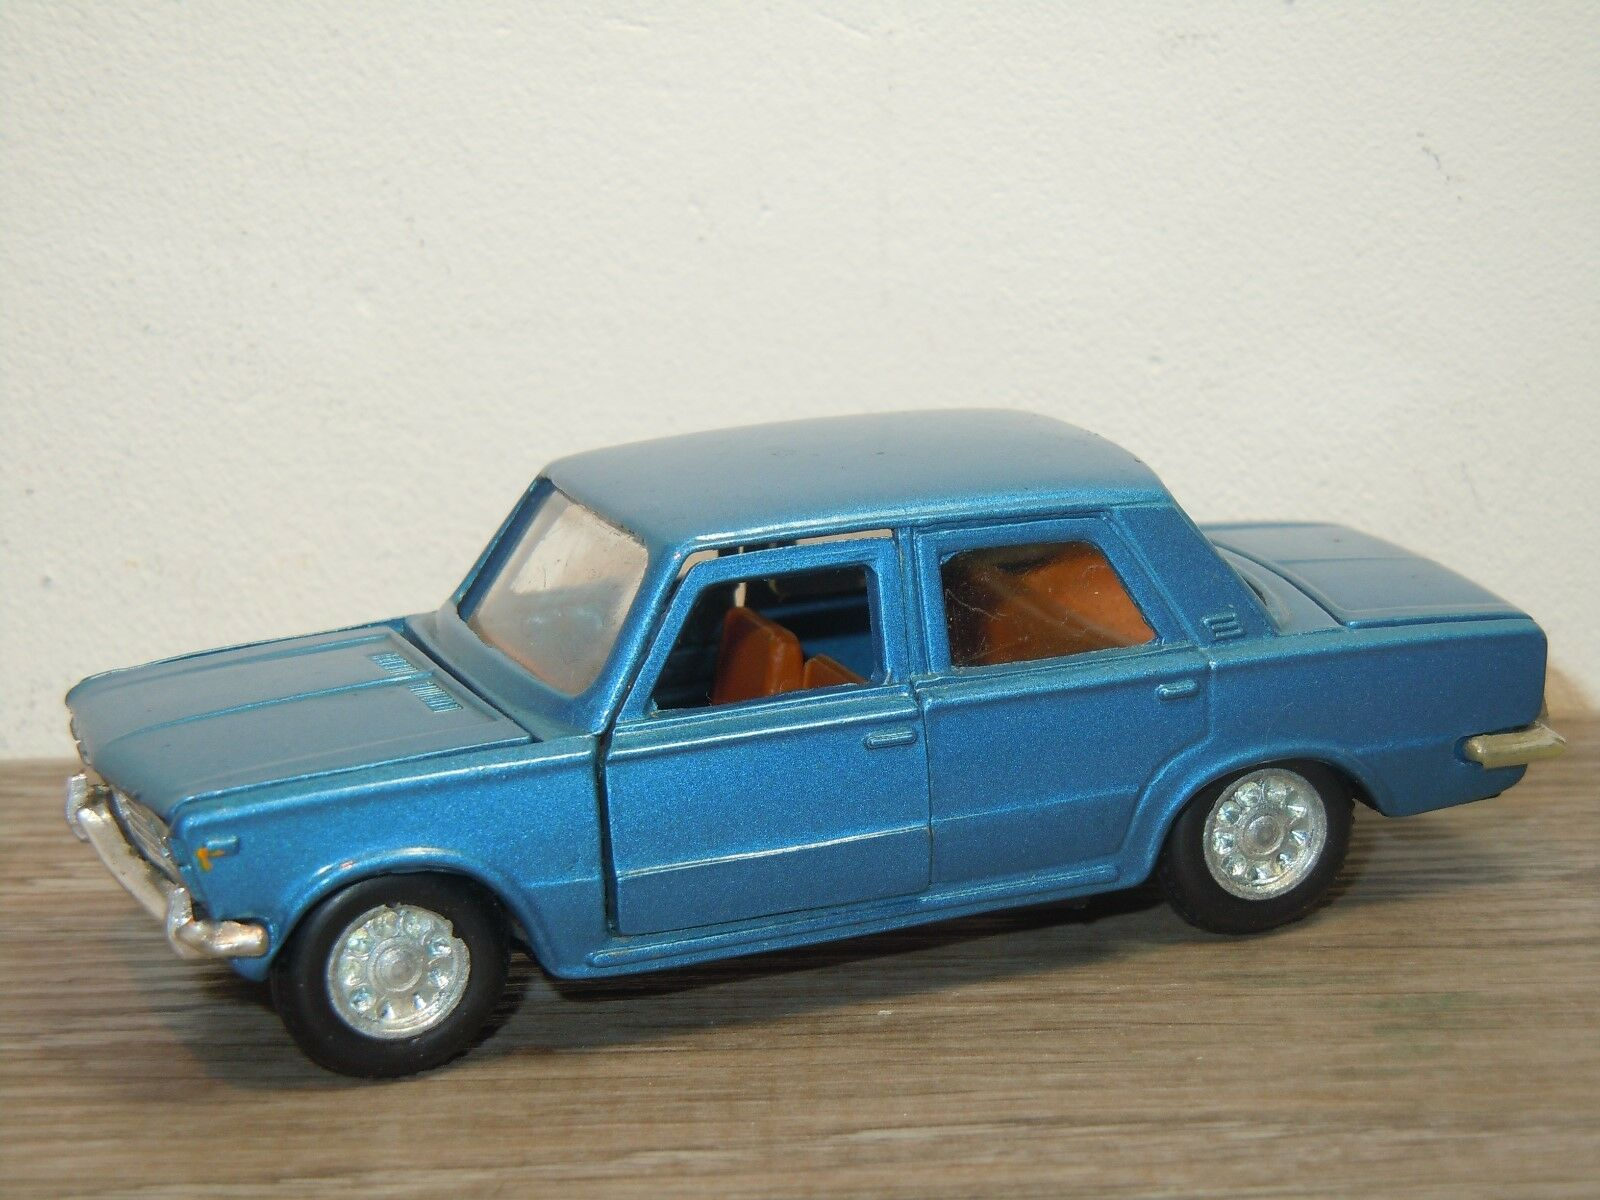 Fiat 125 saloon - quecksilber in italien 1 43  36203